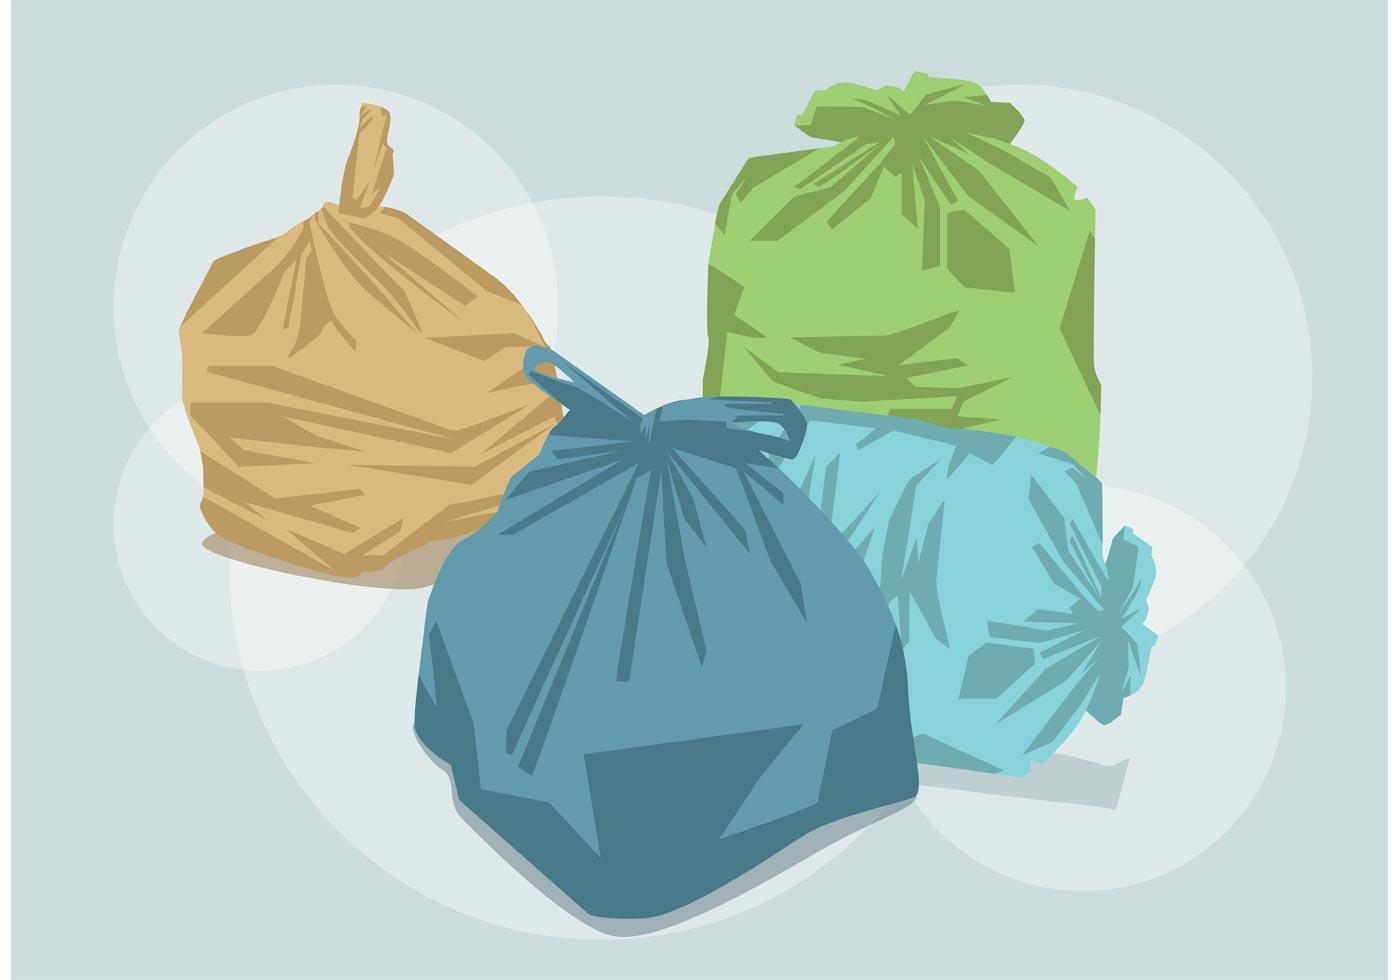 Rubbish Bag Vectors - Download Free Vector Art, Stock ...